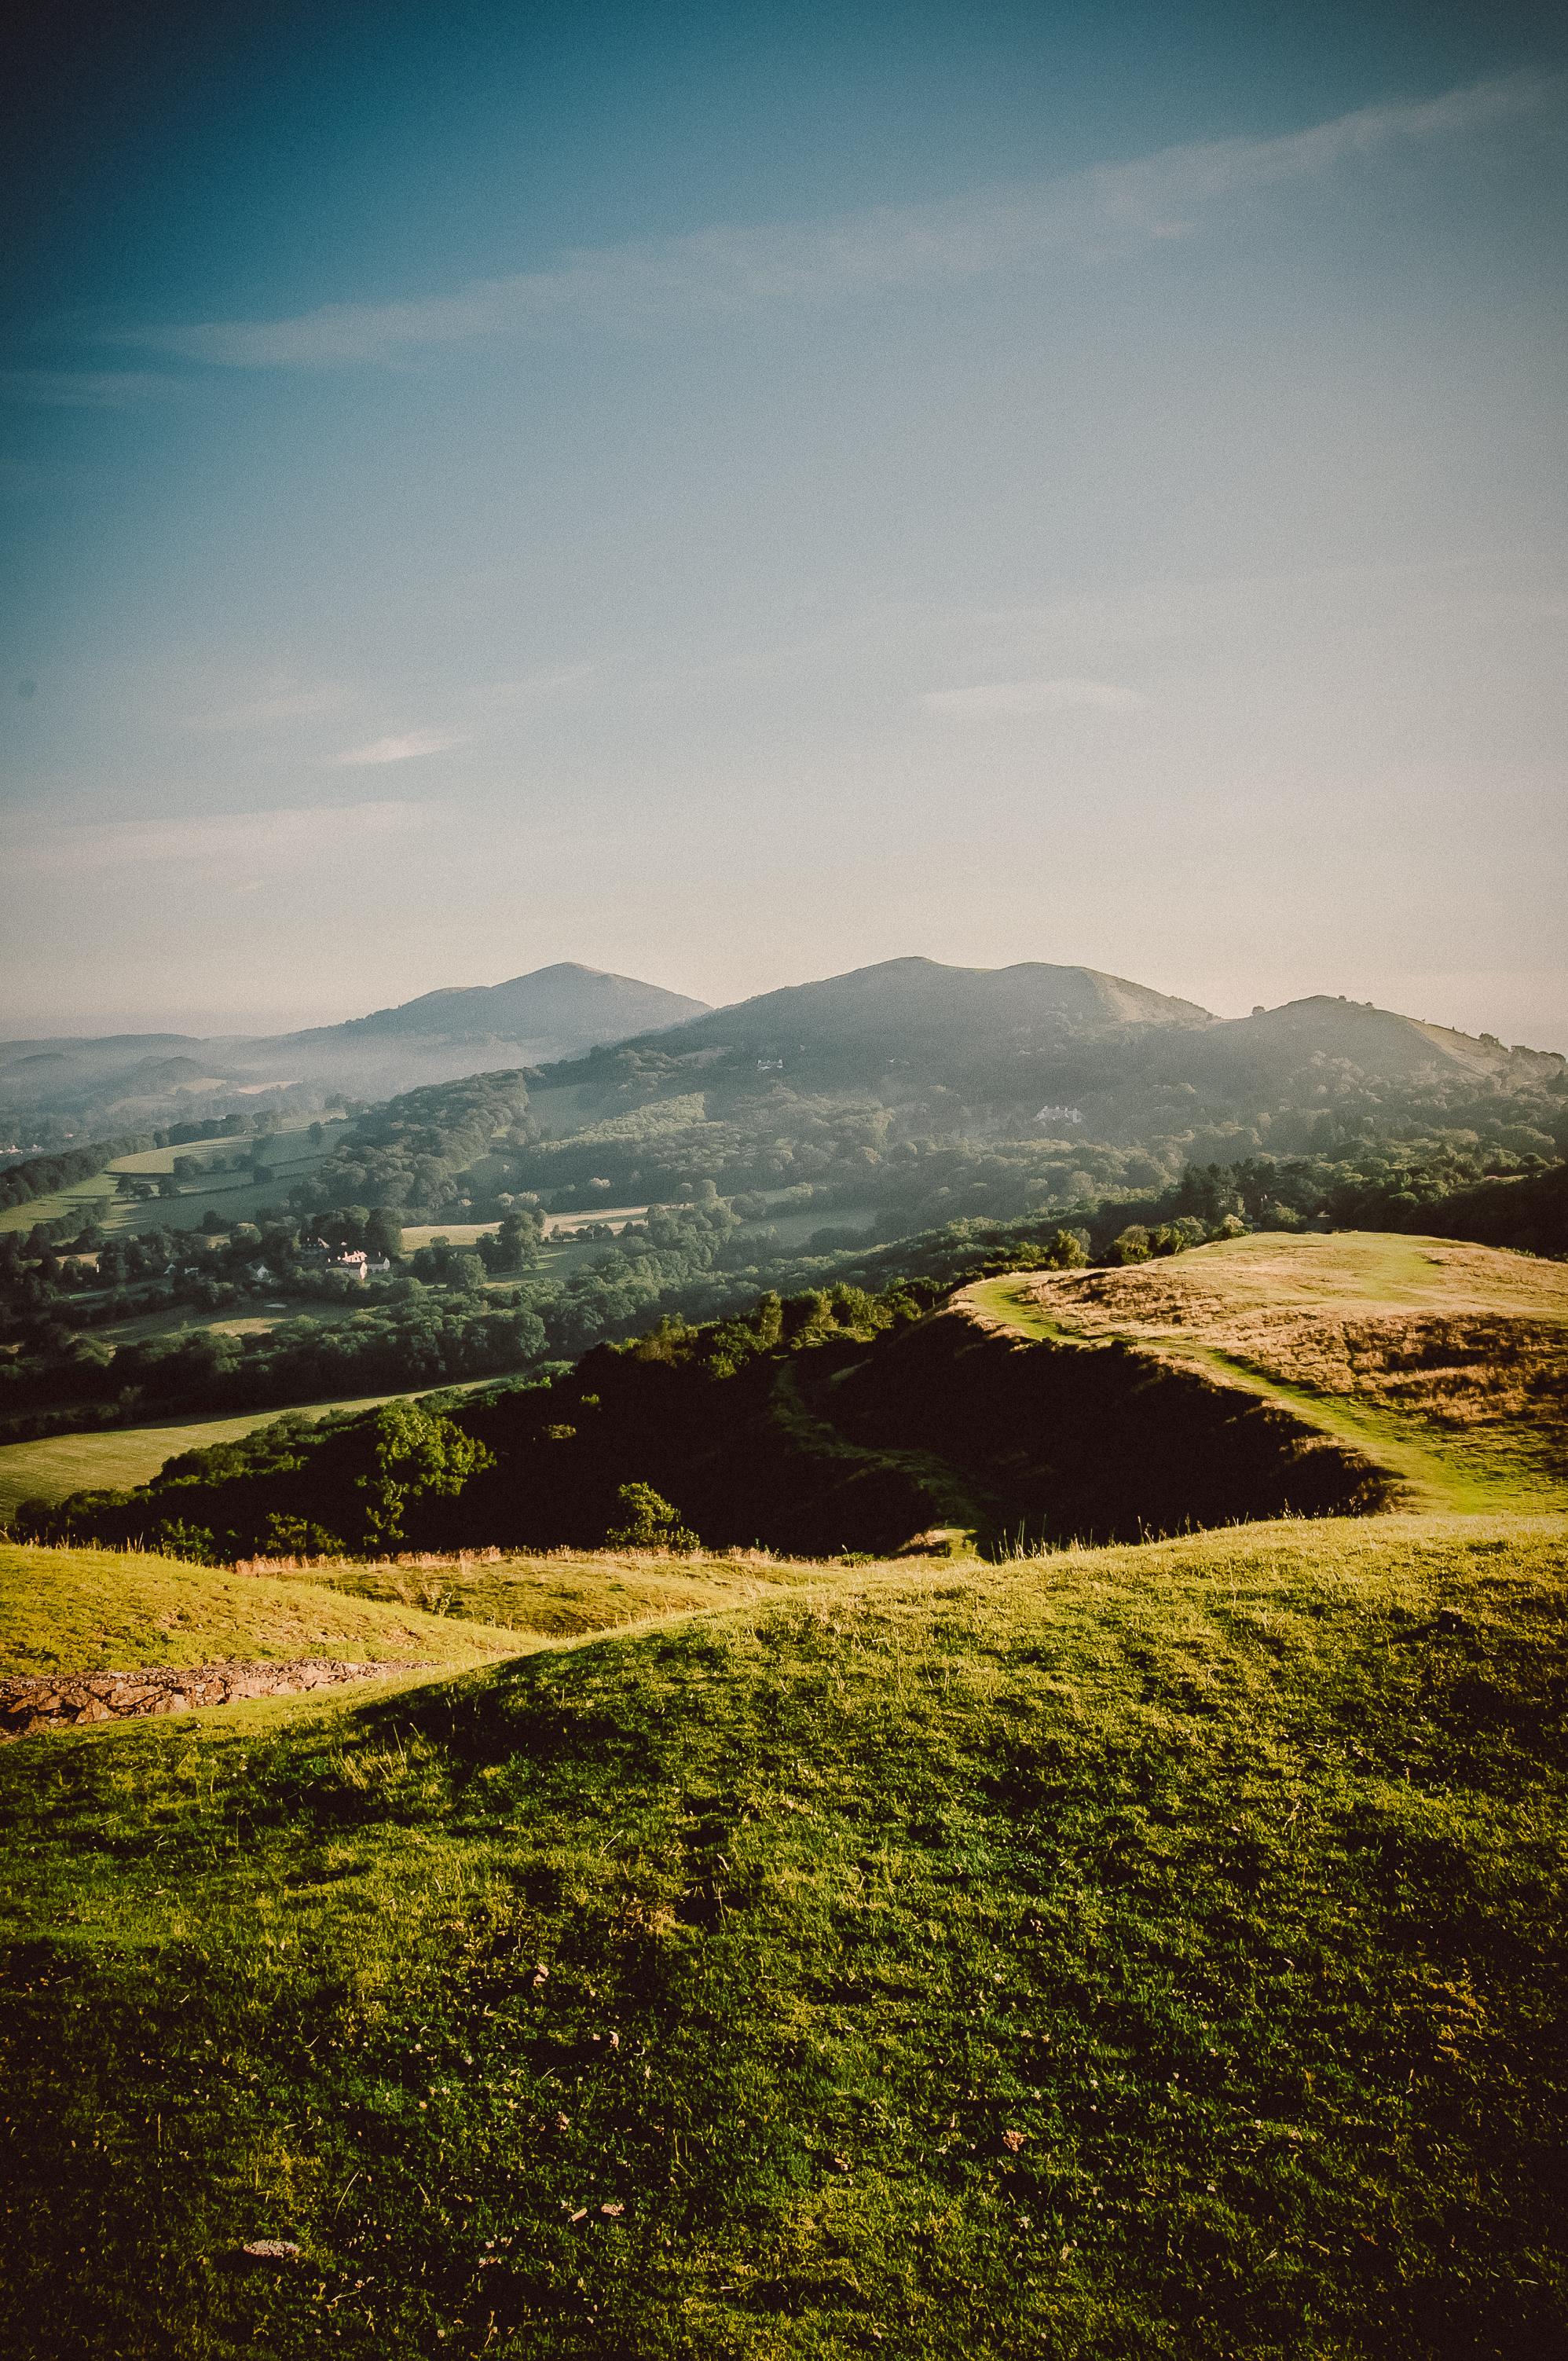 Malvern hills, Worcestershire.  Nikon D300 | 18-50mm | F11 - 1/125th - iso200